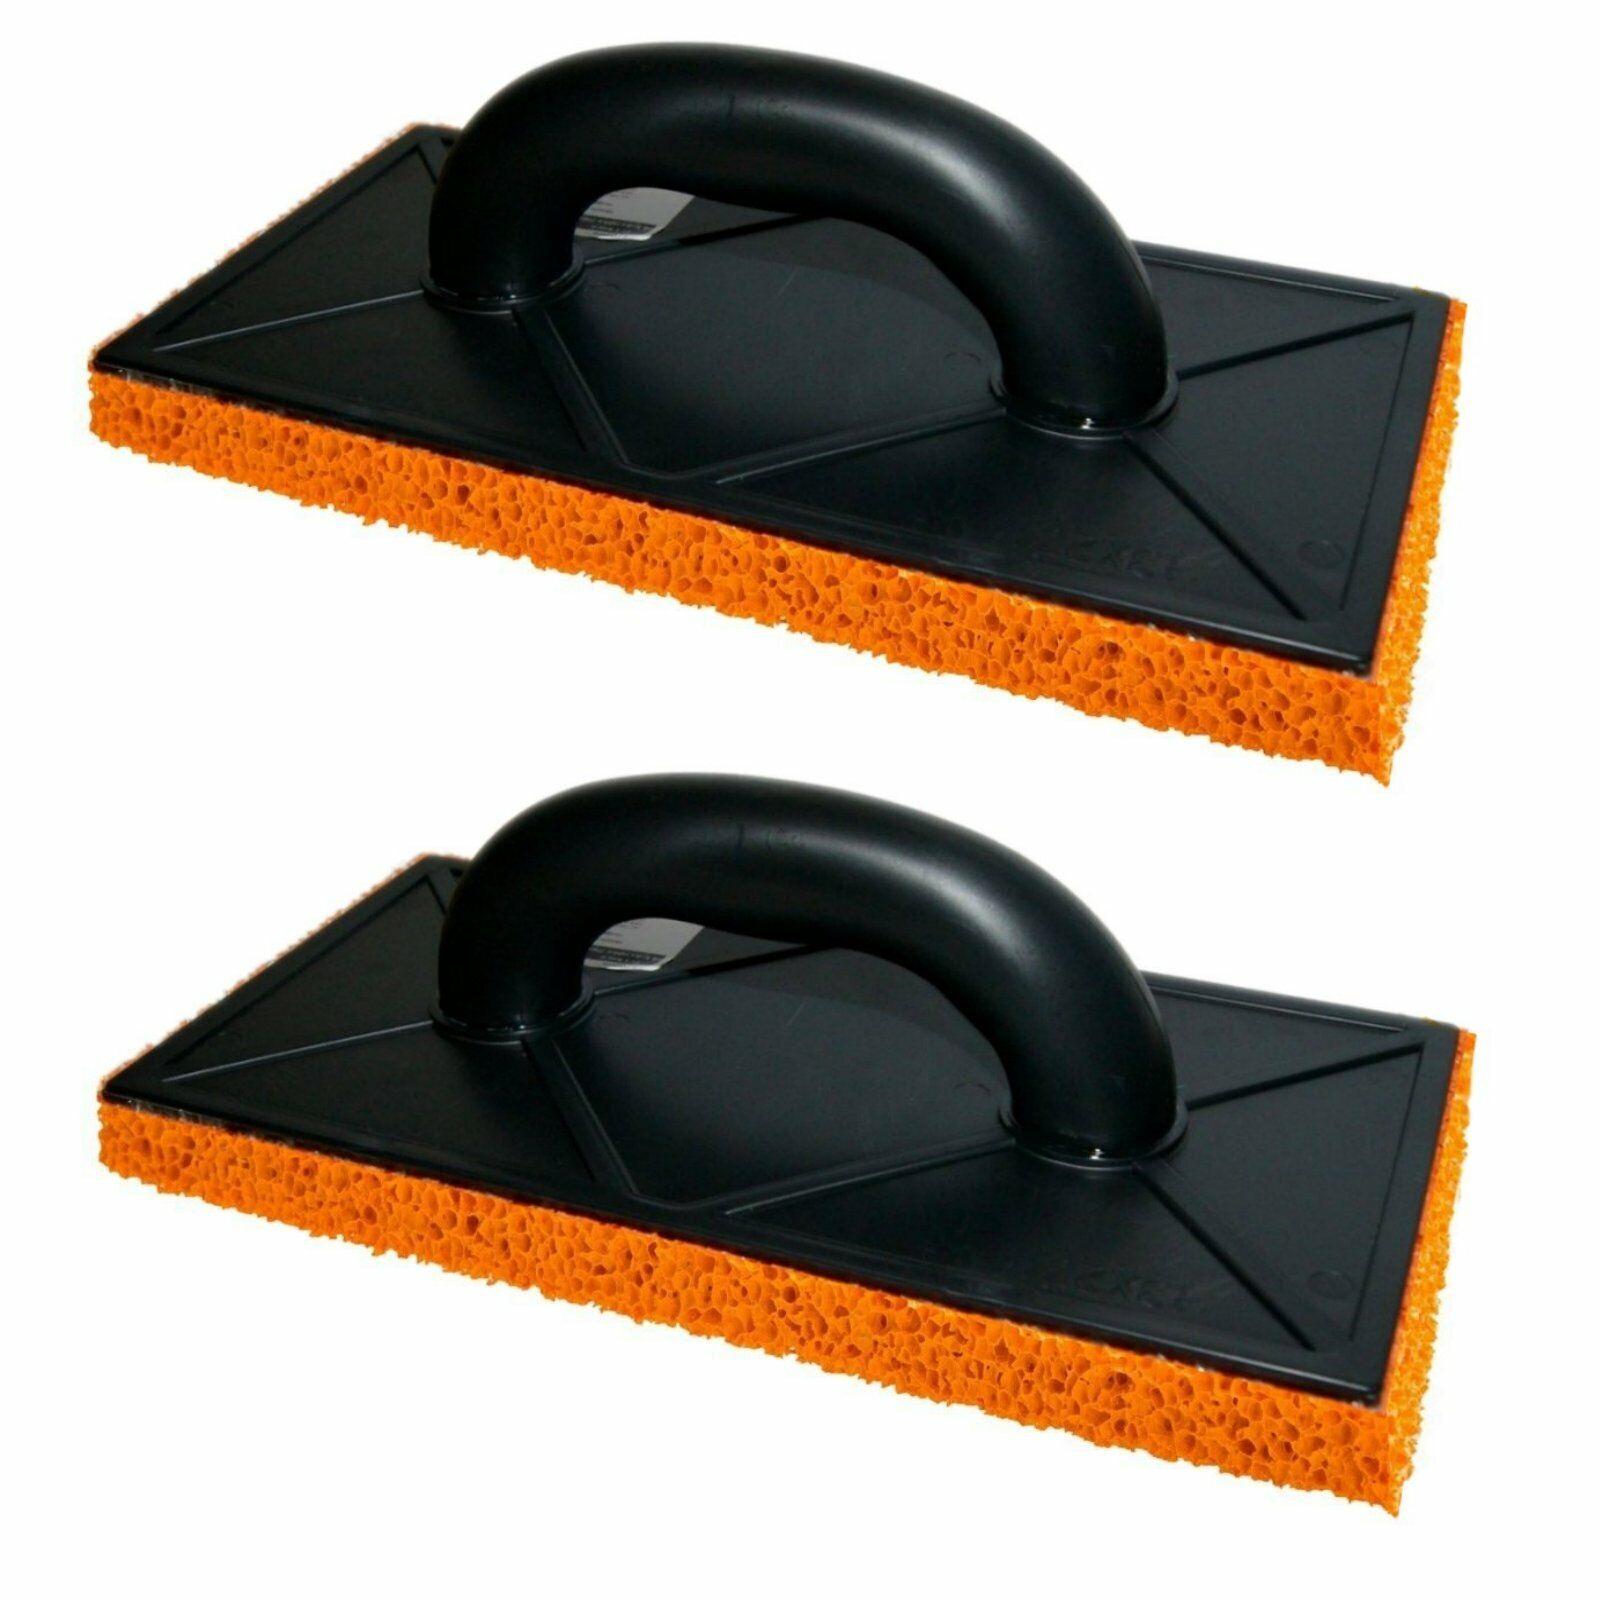 2 x Orange Sponge Float Rubber 280mm Plastering Rendering Medium Rough Coarse